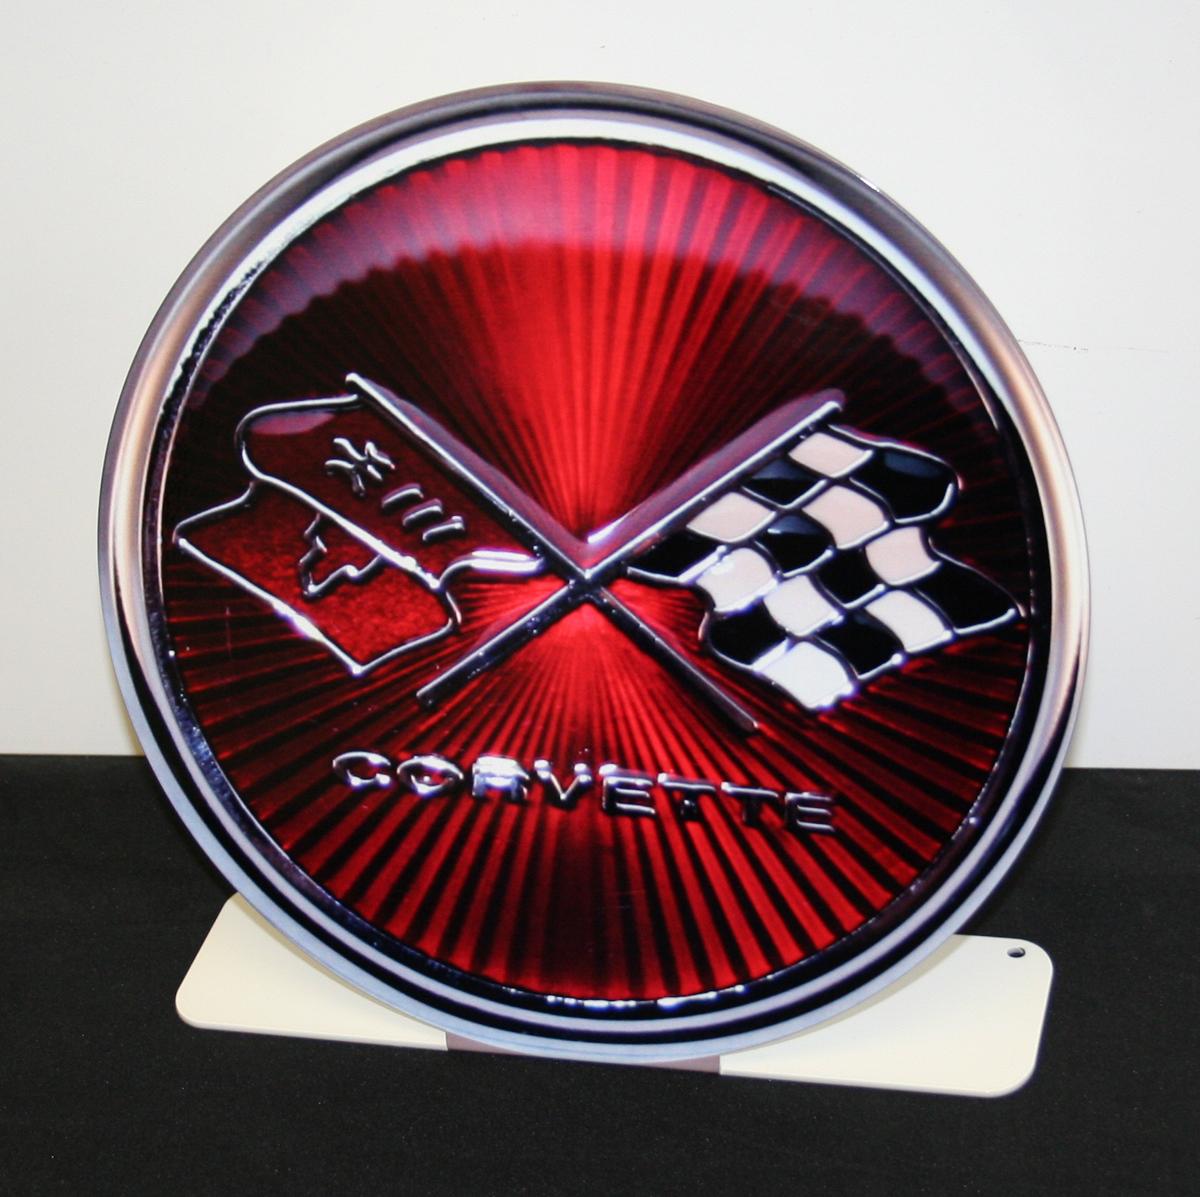 C3 Corvette Emblem Desk Stand-ChevyMall